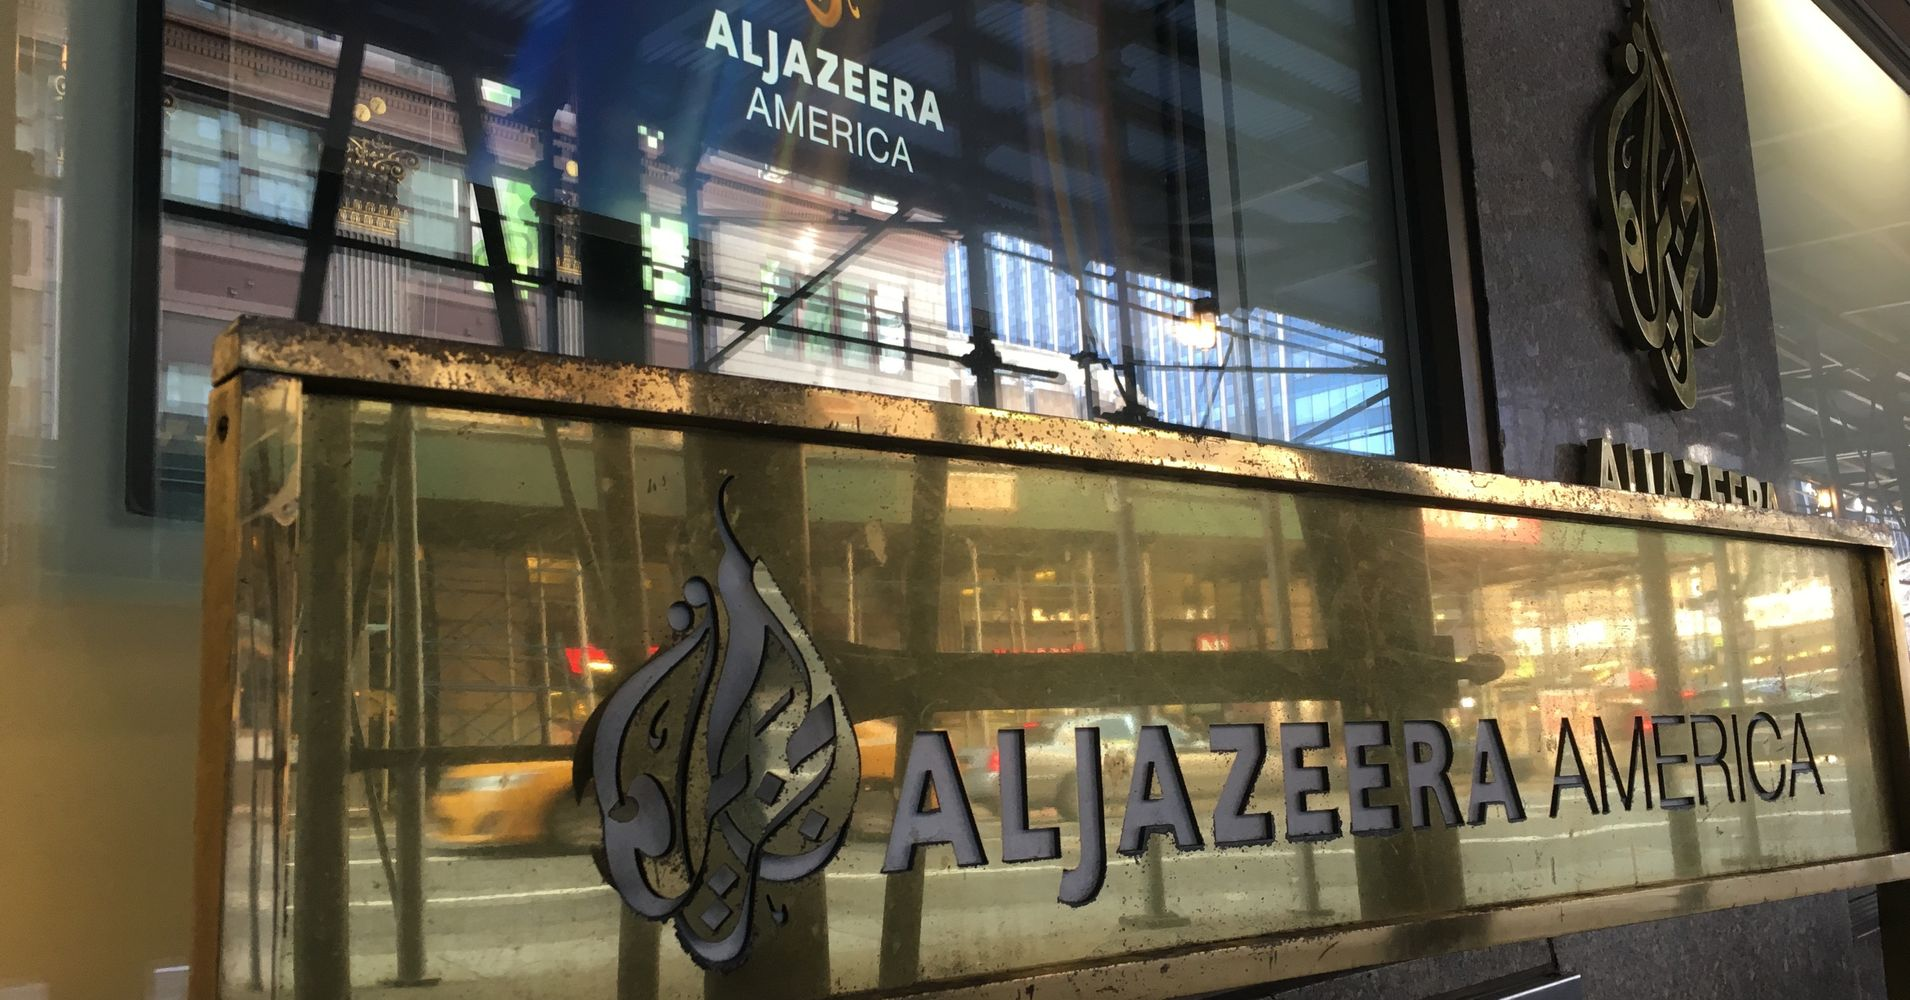 From Aljazeera America Via Real Clear >> Why Al Jazeera America Failed And Why We Need It More Than Ever